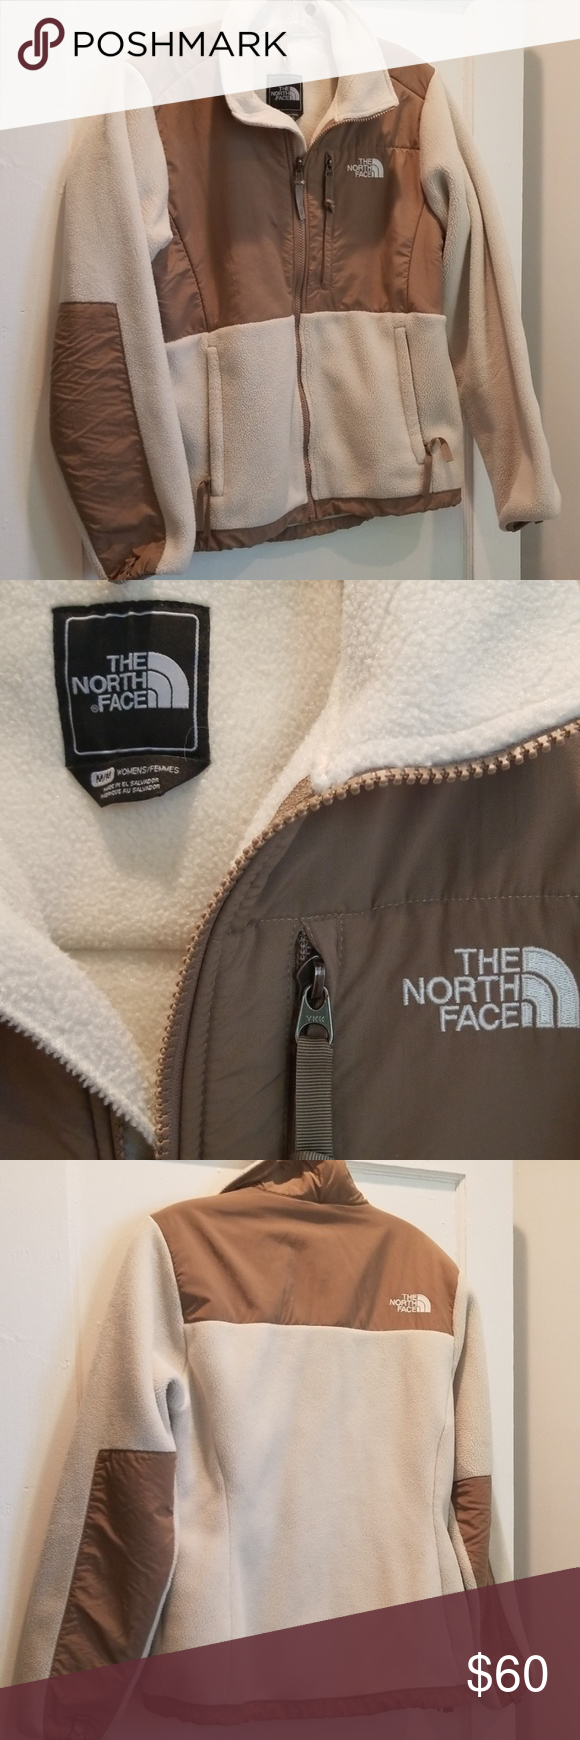 The North Face Denali Fleece Full Zip In Tan Cream The North Face North Face Jacket Clothes Design [ 1740 x 580 Pixel ]